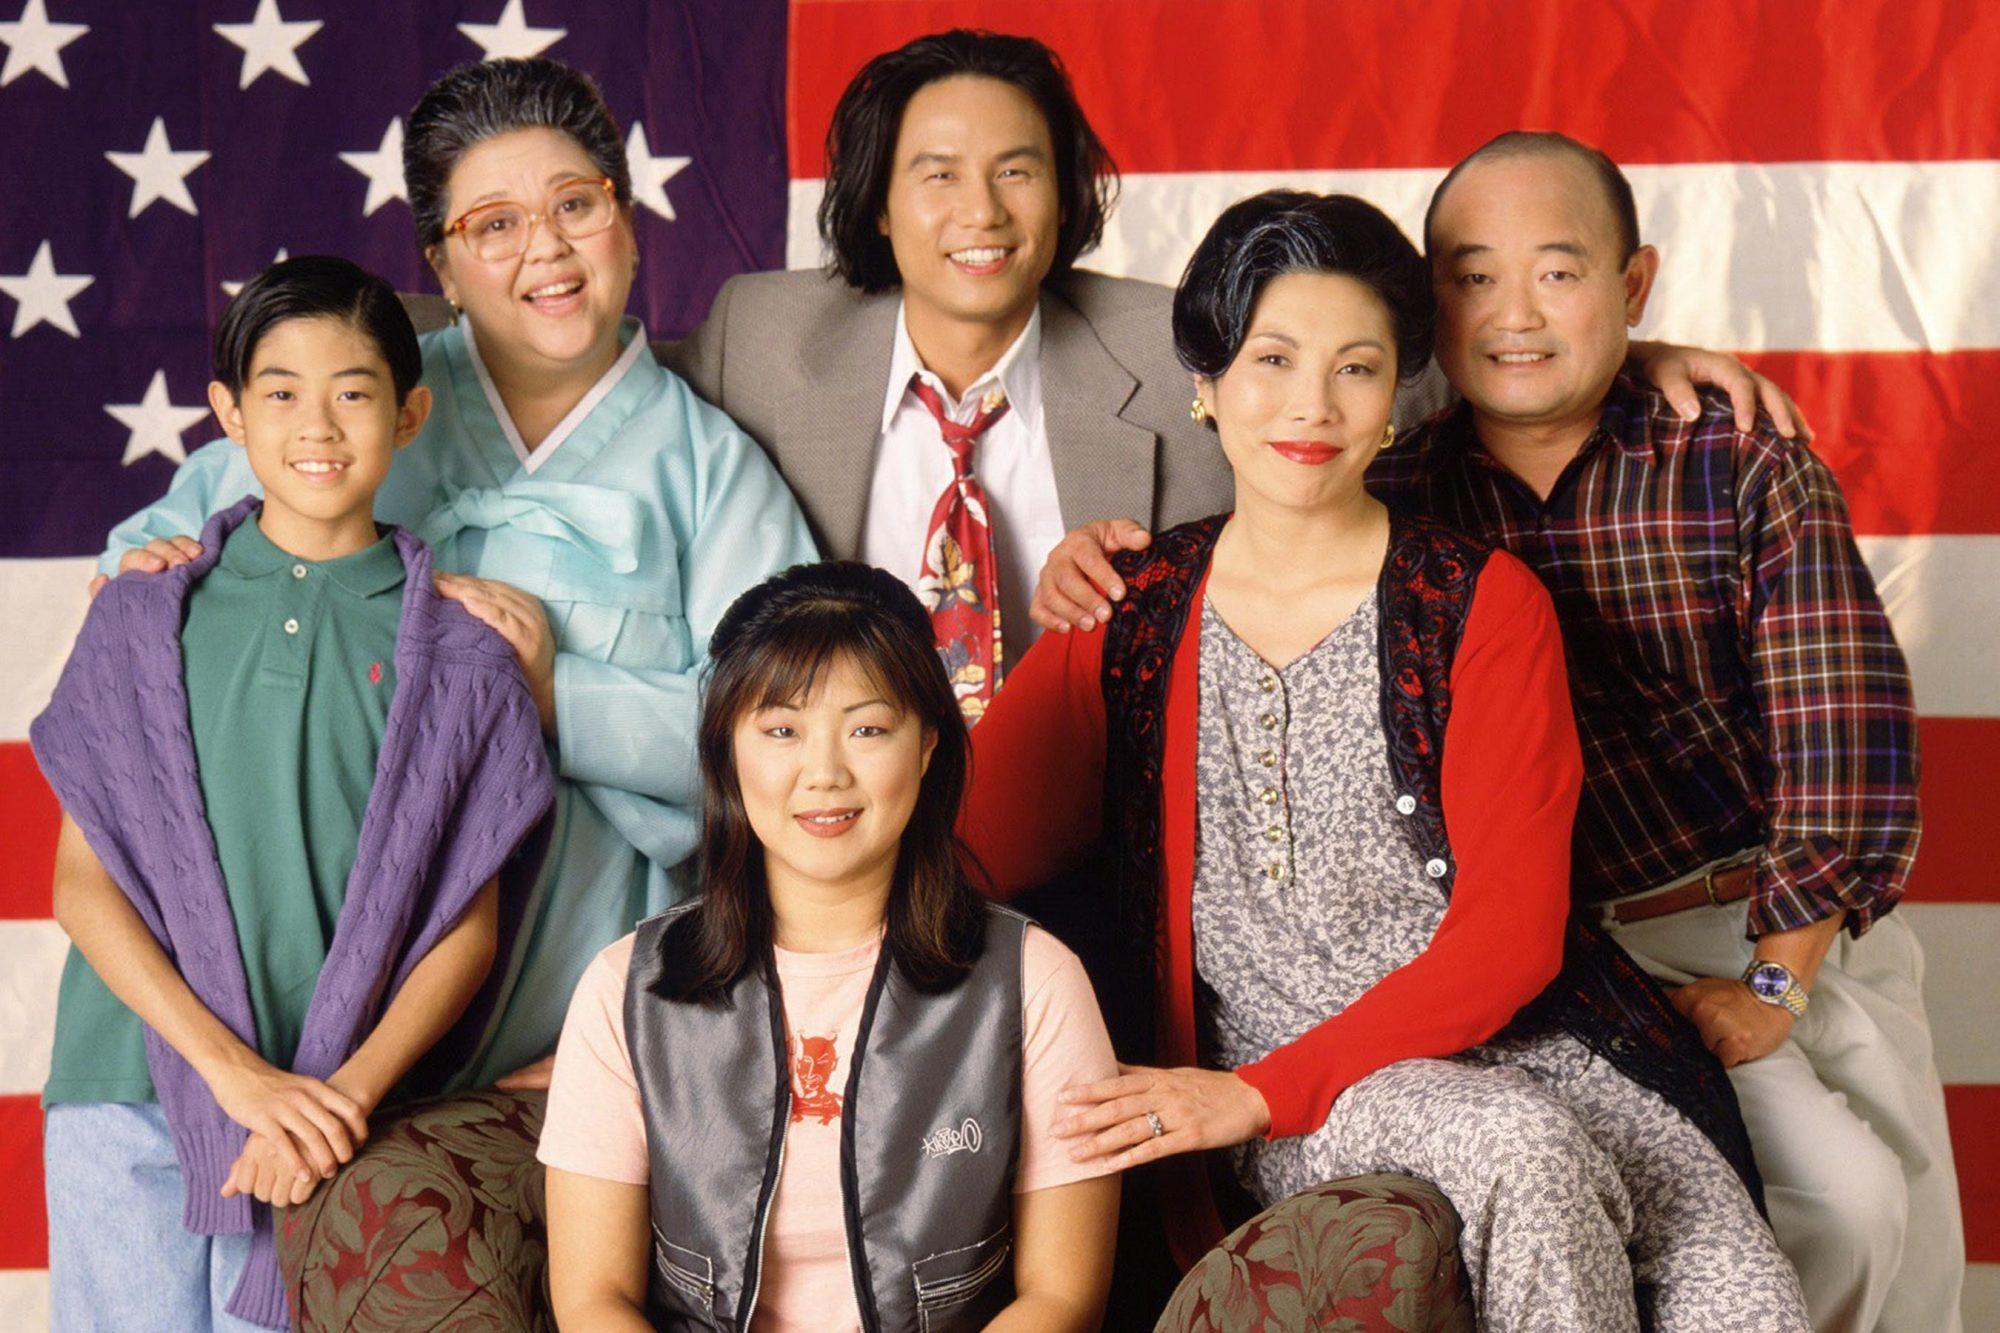 ALL-AMERICAN GIRL, J.B. Quon, Amy Hill, B.D. Wong, Jodi Long, Clyde Kusatsu, Margaret Cho (front), 1